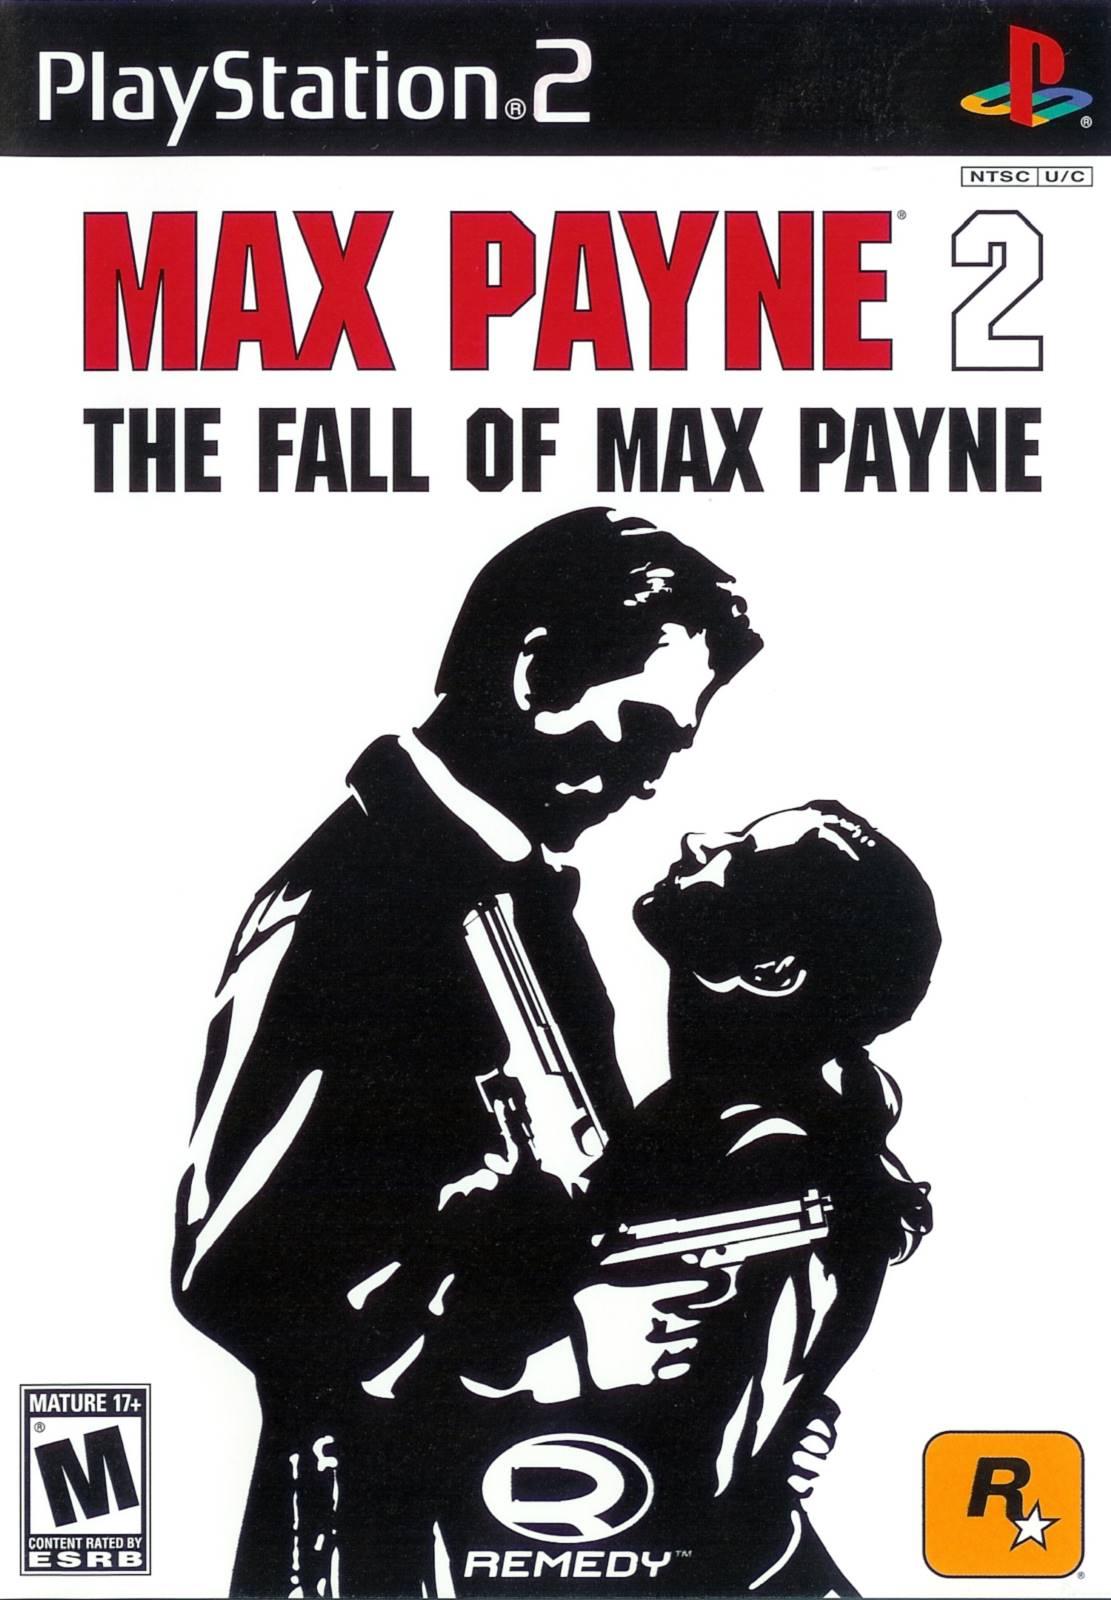 Max Payne 2 Fall of Max Payne Sony Playstation 2 Game